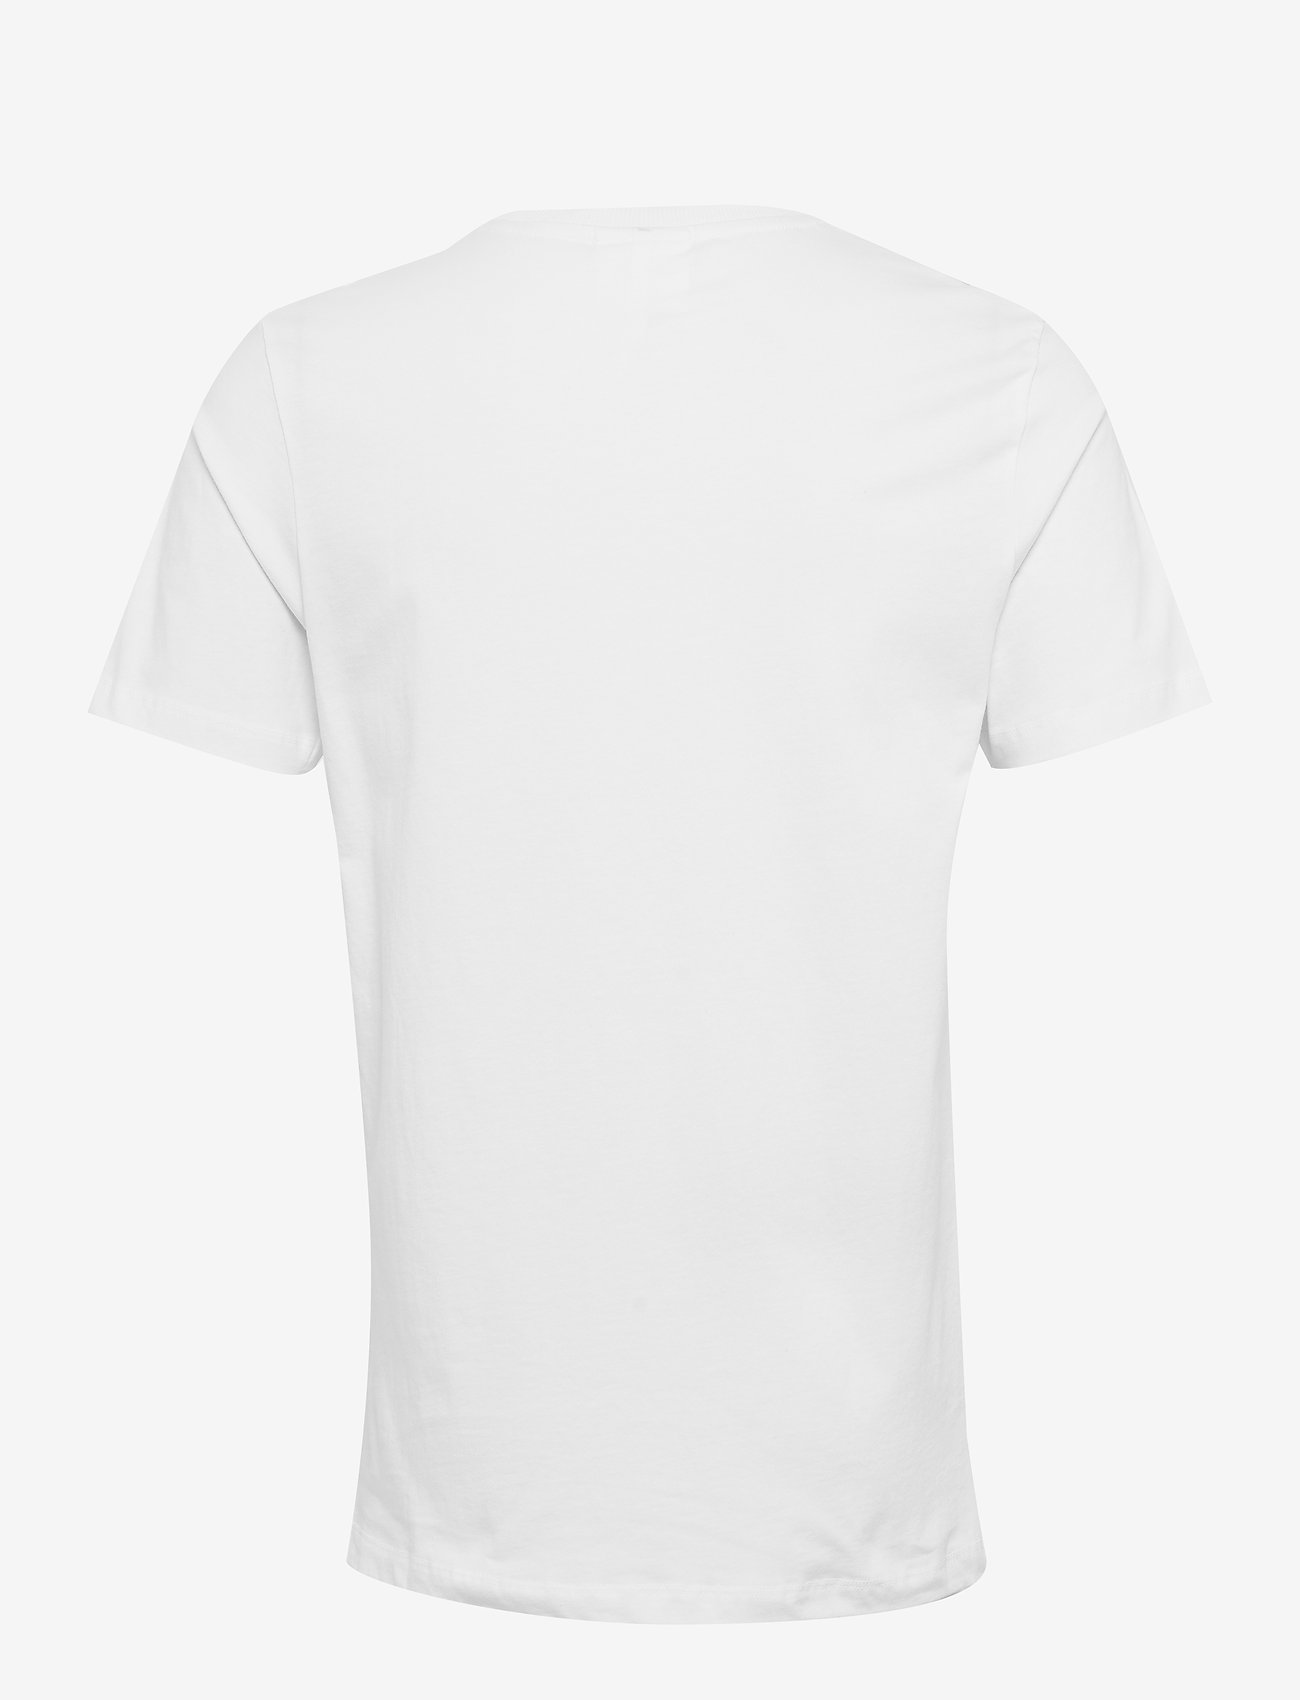 Logic Saleh T-shirt W. Print (White) - Soulland WrEjUI